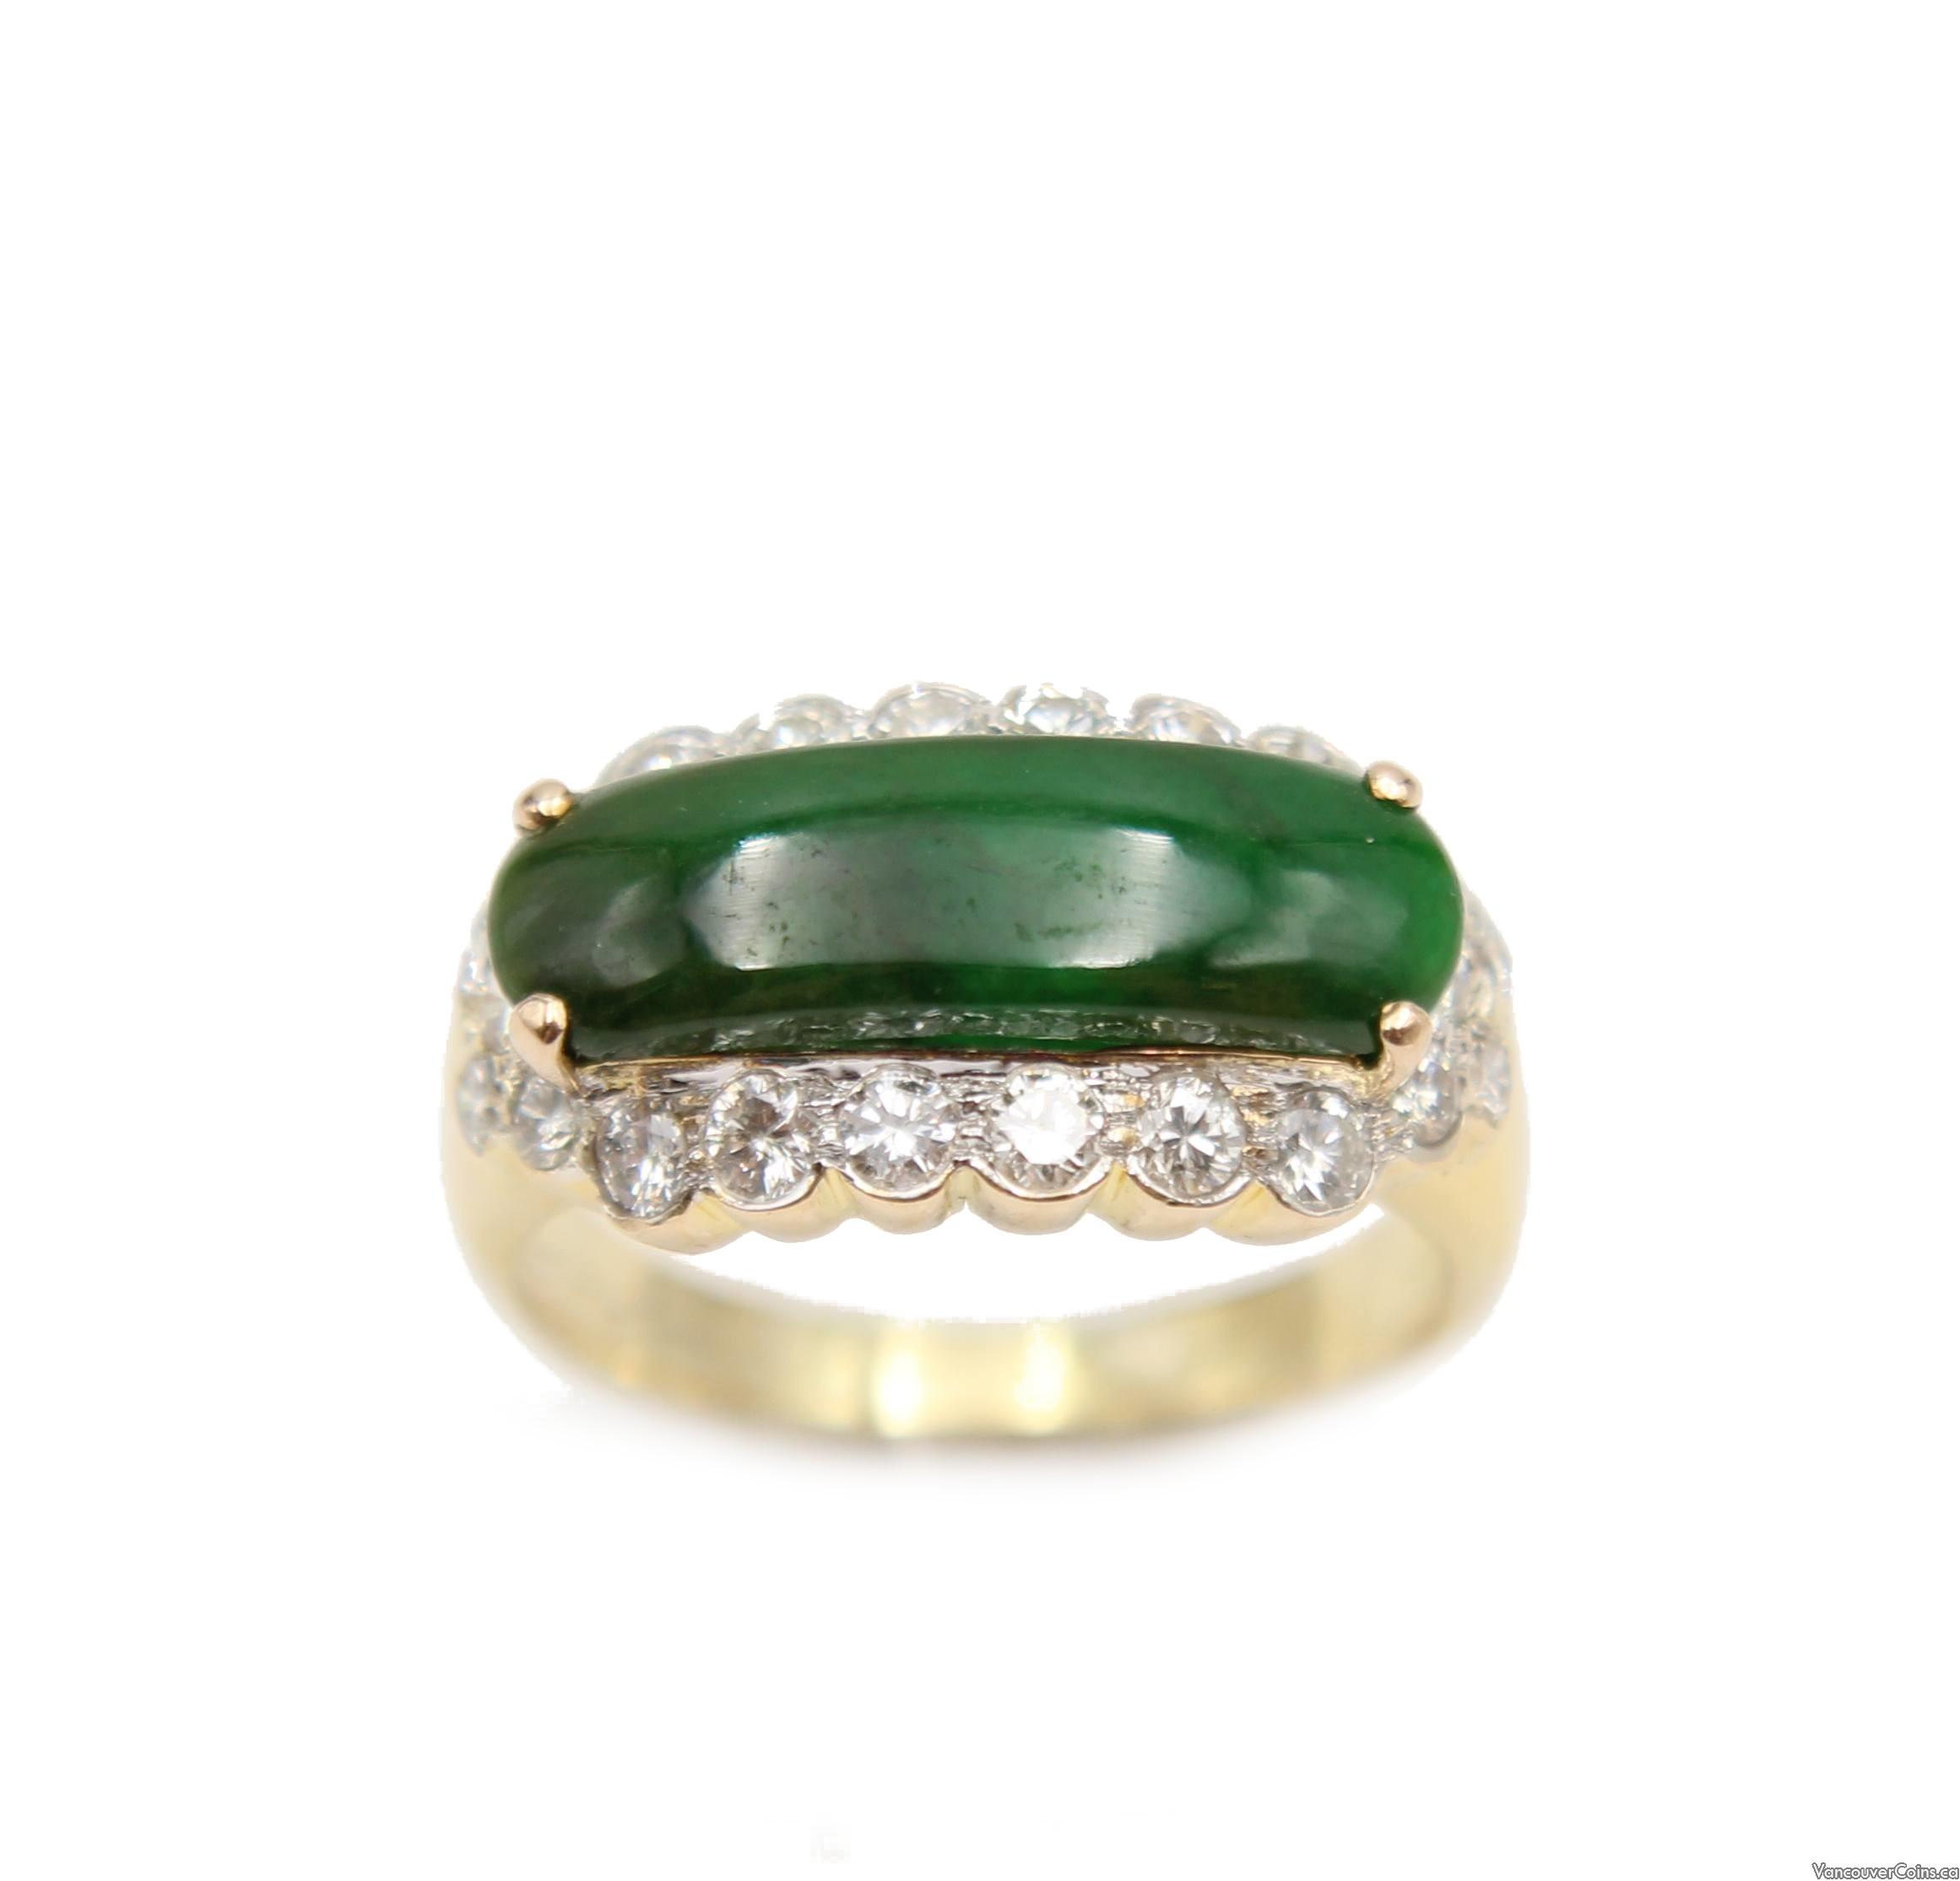 Burmese Jade & Diamonds 14K yellow gold ring